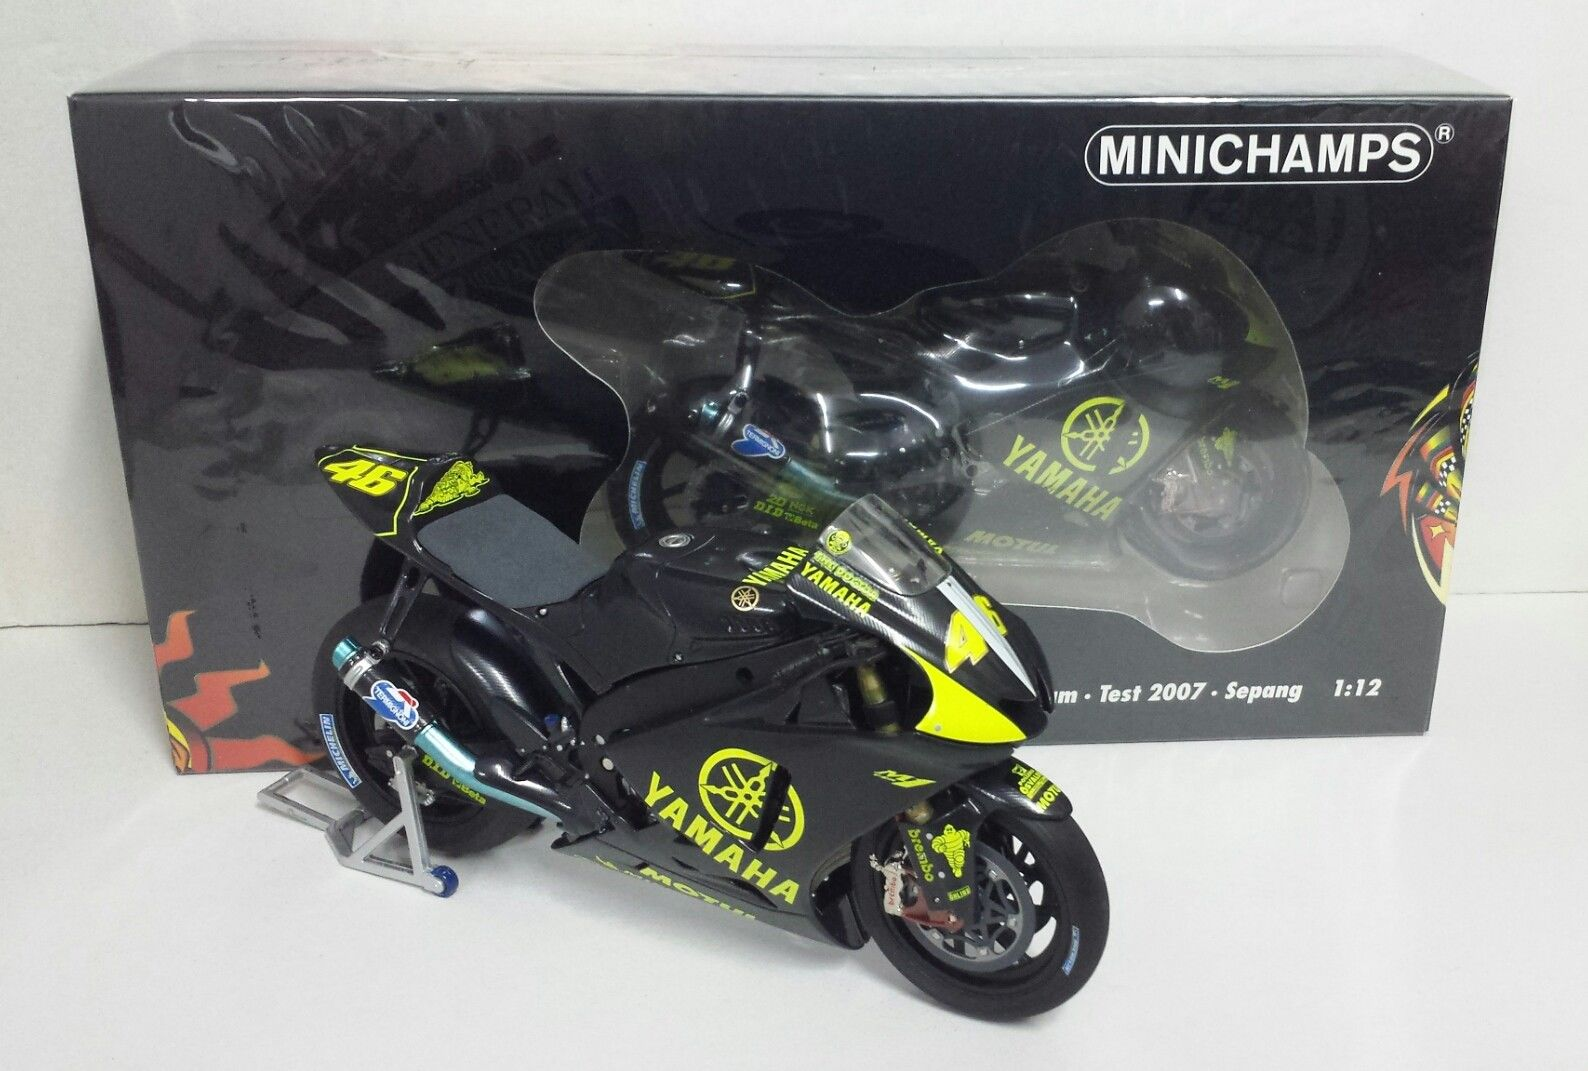 MINICHAMPS VALENTINO ROSSI 1/12 YAMAHA M1 MOTOGP - TEST SEPANG 2007 L.E.1007 NEW